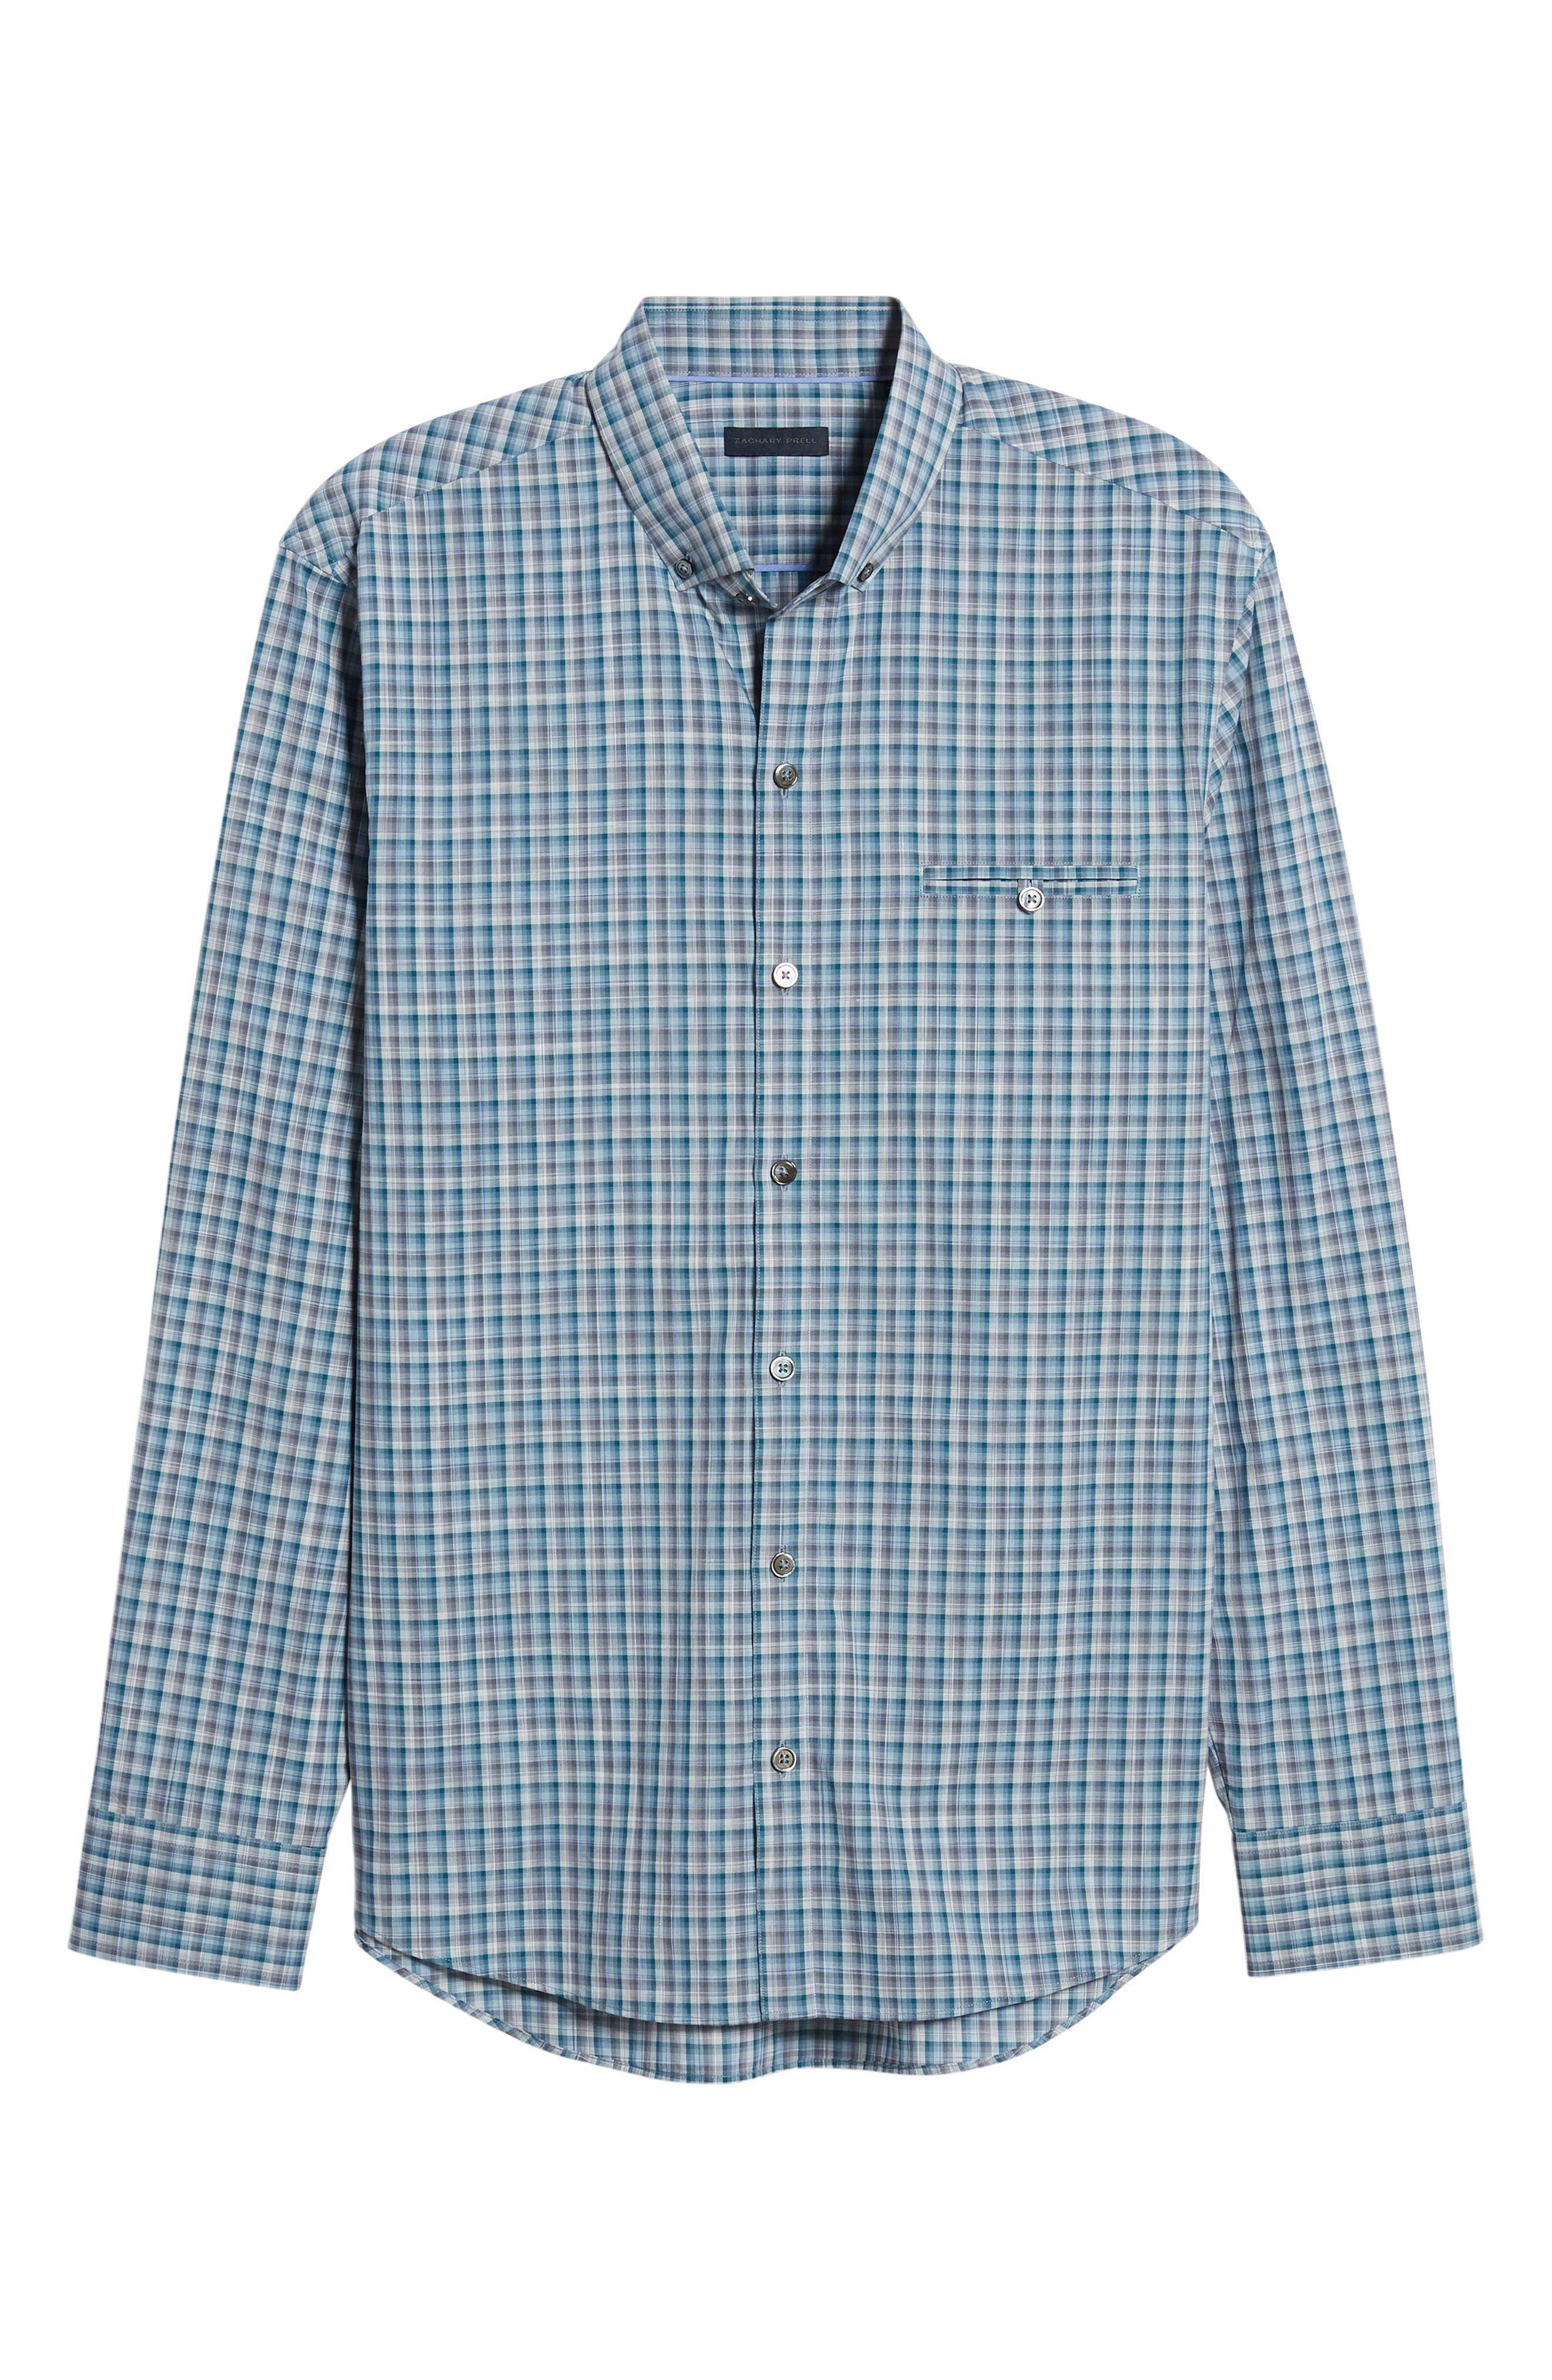 ZACHARY PRELL, Godinez Regular Fit Check Sport Shirt, Alternate thumbnail 5, color, 475